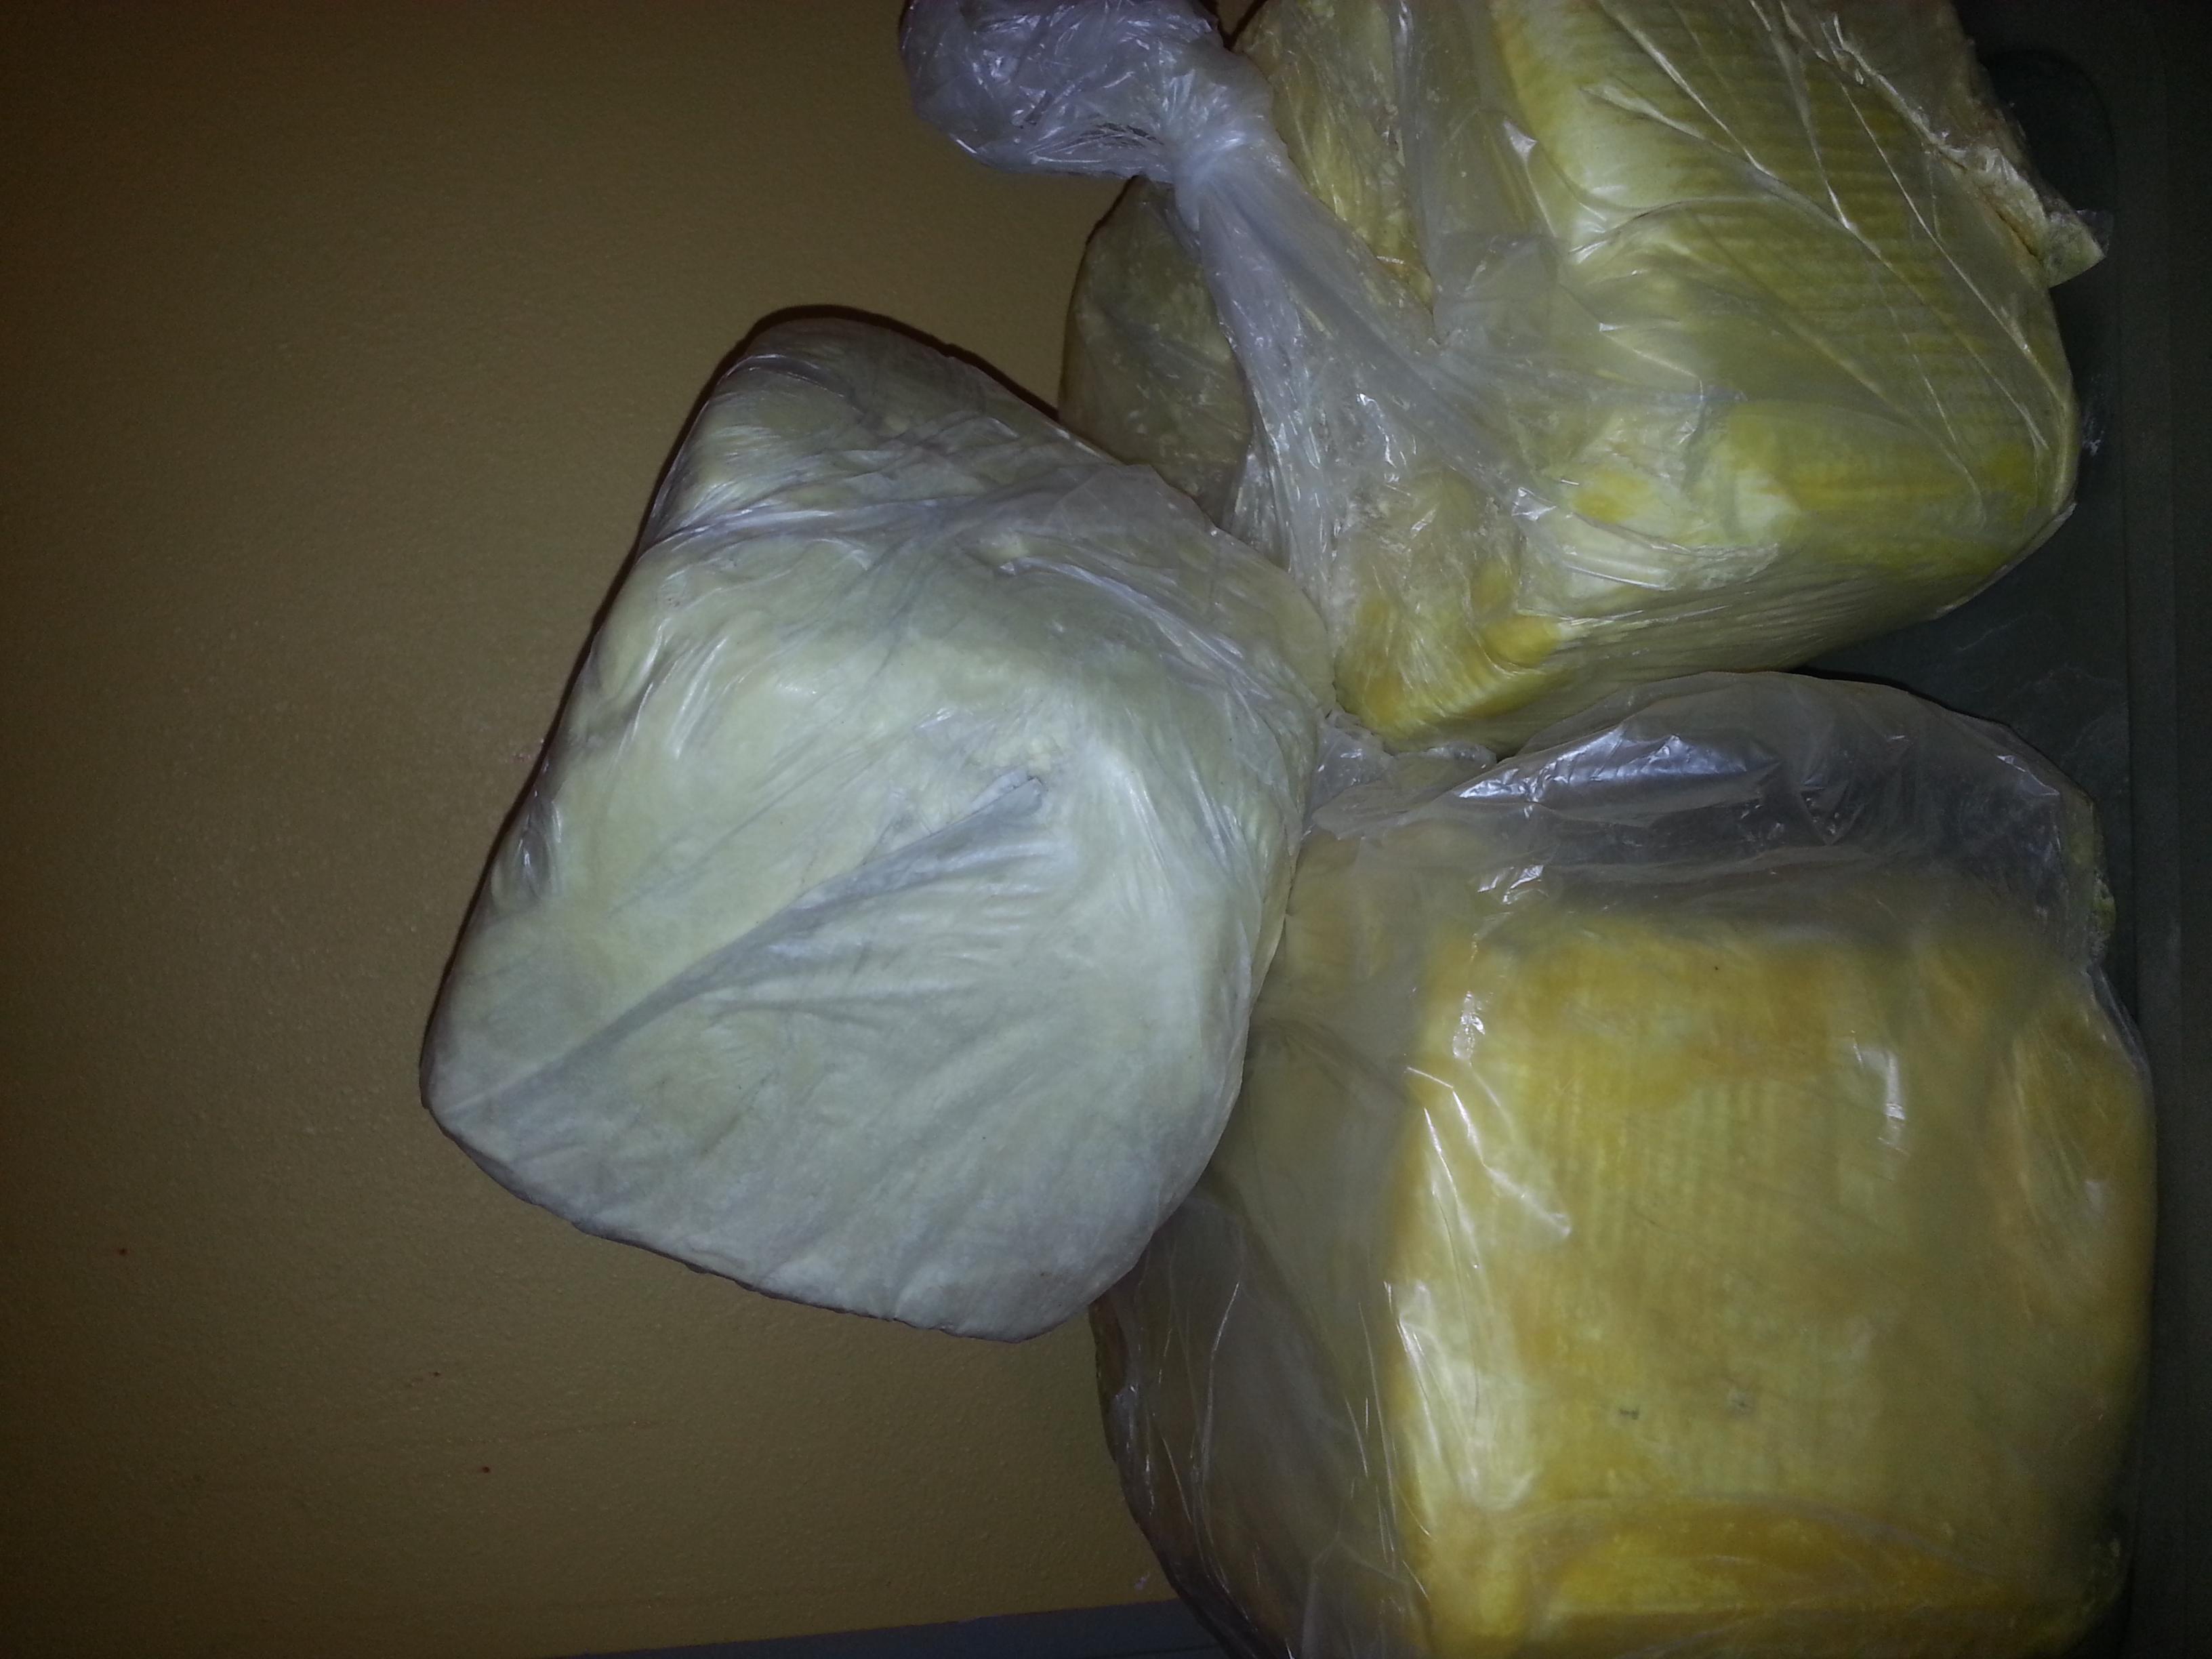 Unrefined Grade A Shea Butter      5lbs minimum      $2.95 per lbs